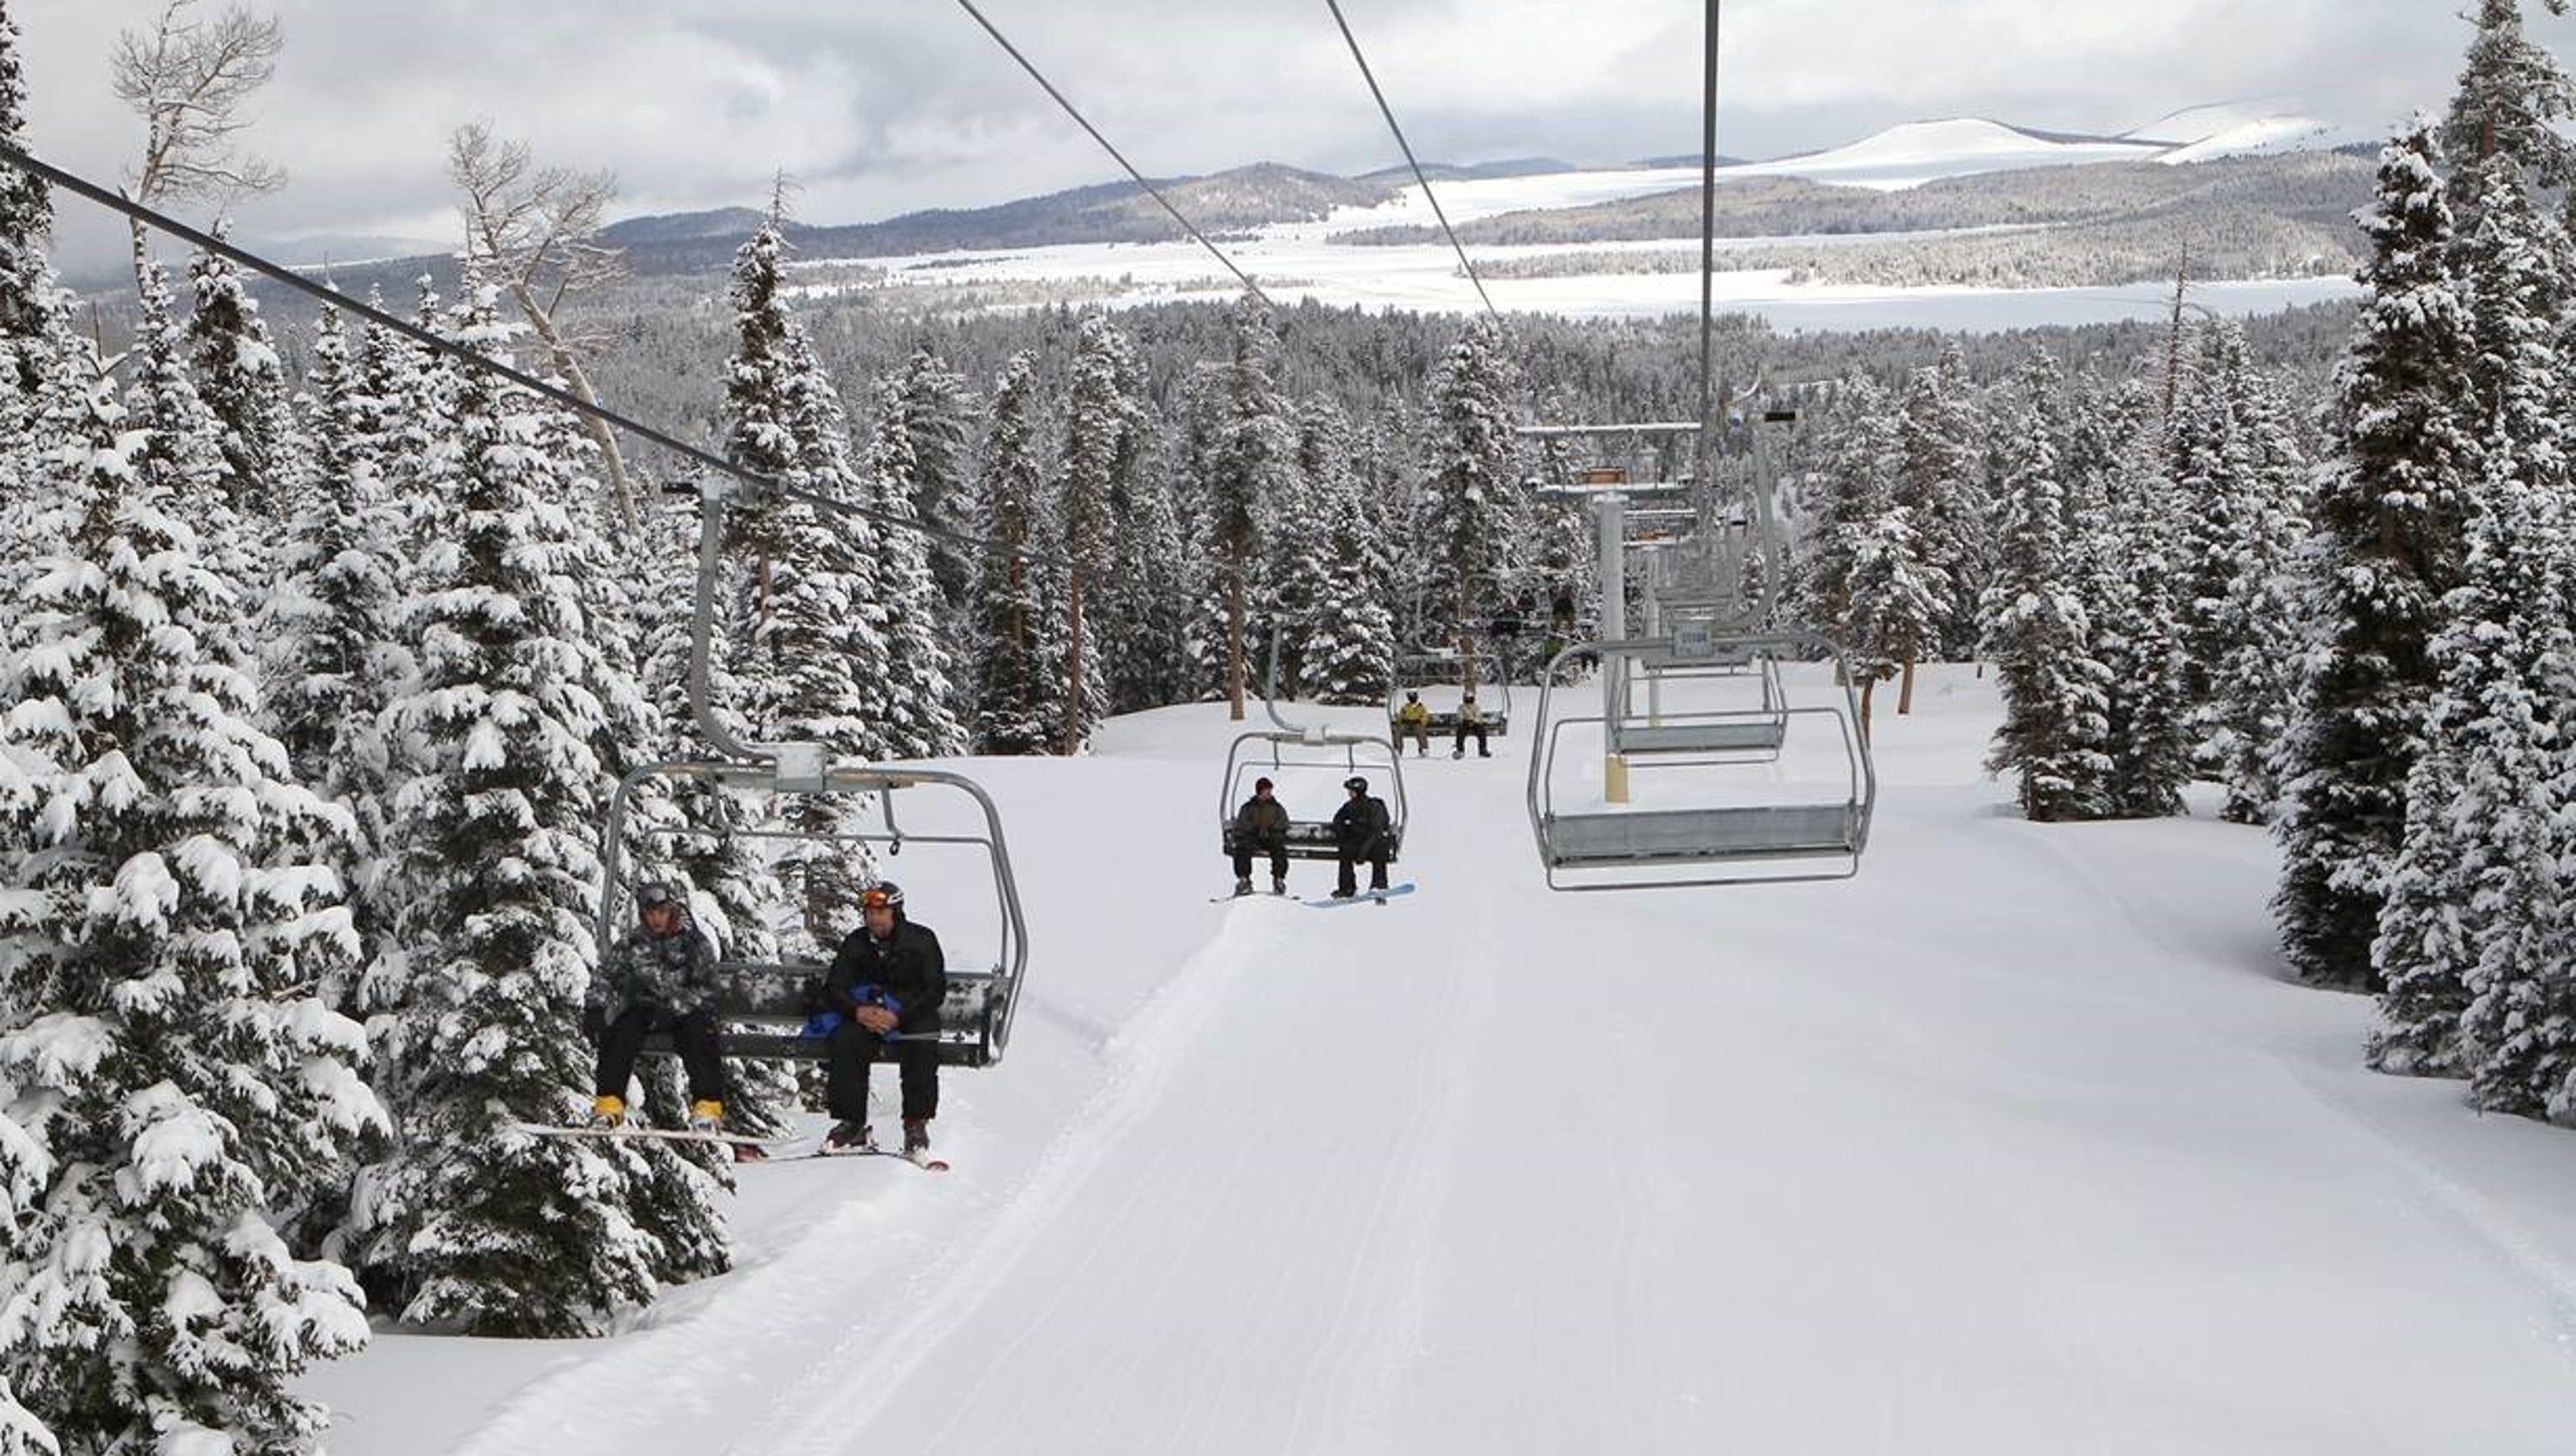 ski in the new year at sunrise park, snowbowl